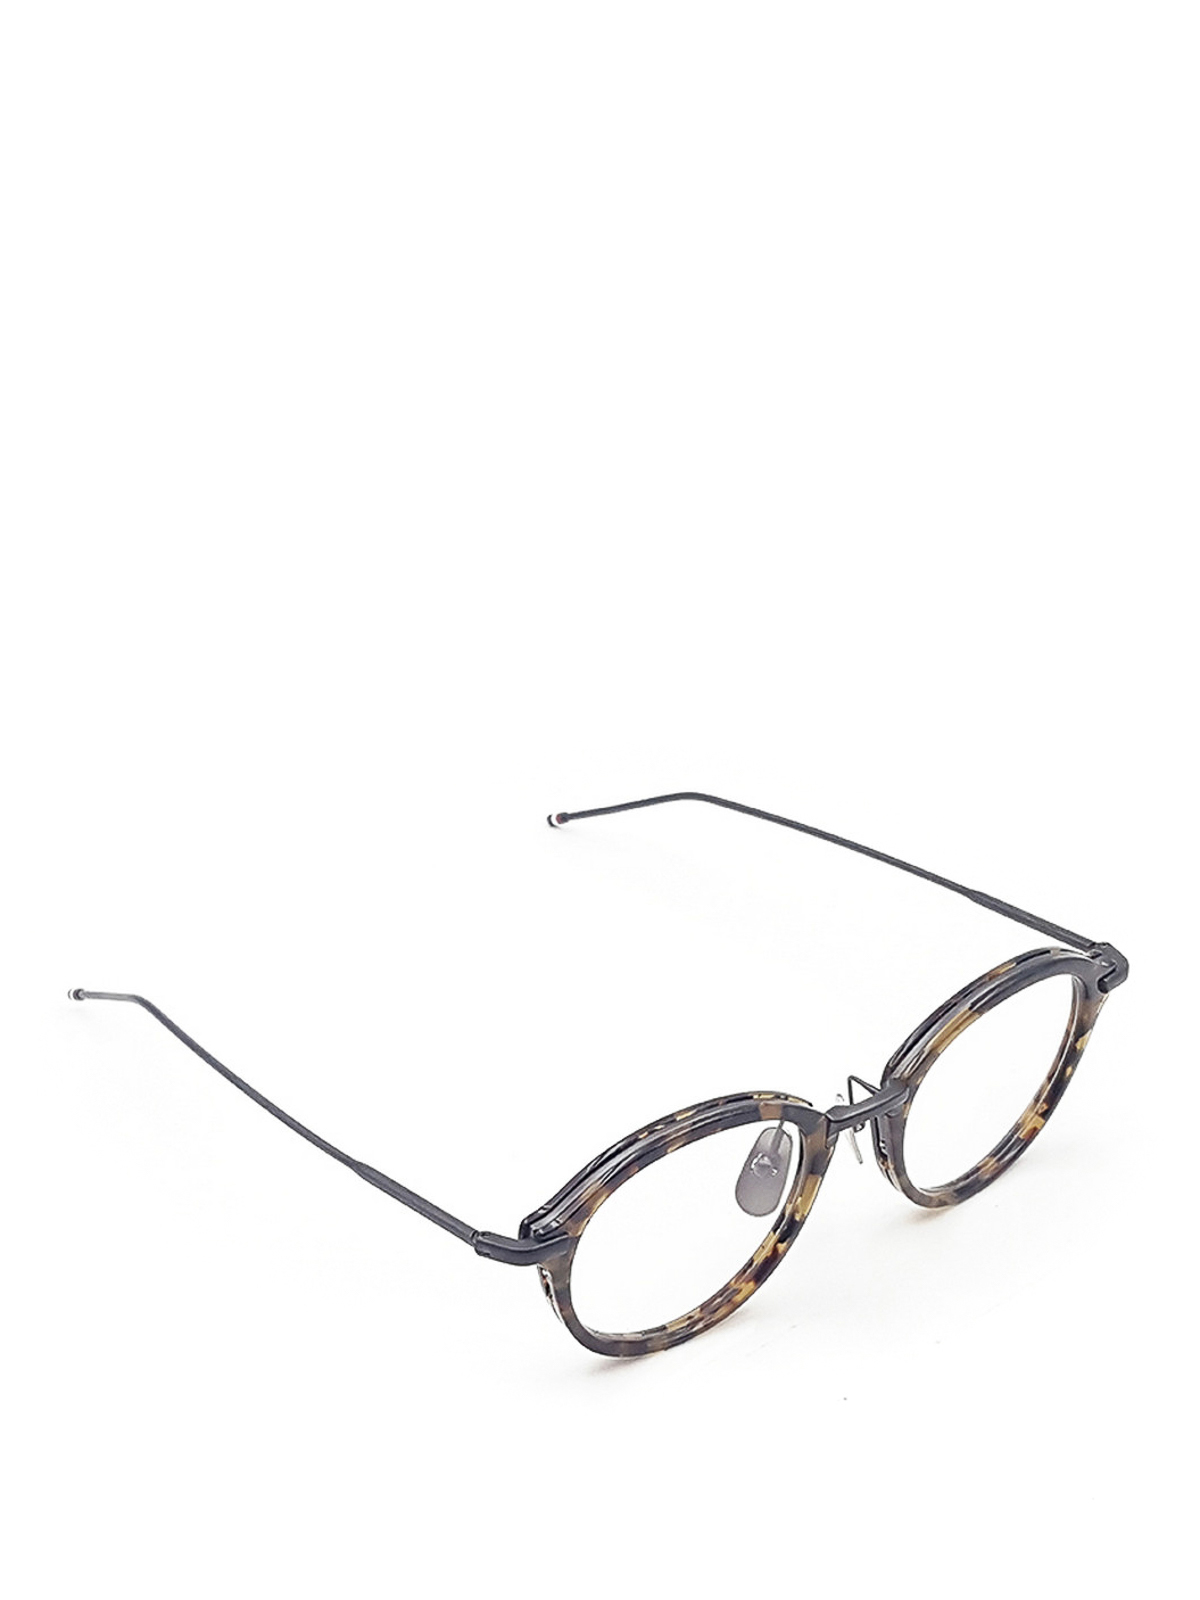 621b442471dd Thom Browne - Tortoiseshell optical glasses - glasses - TB-011-B-T ...